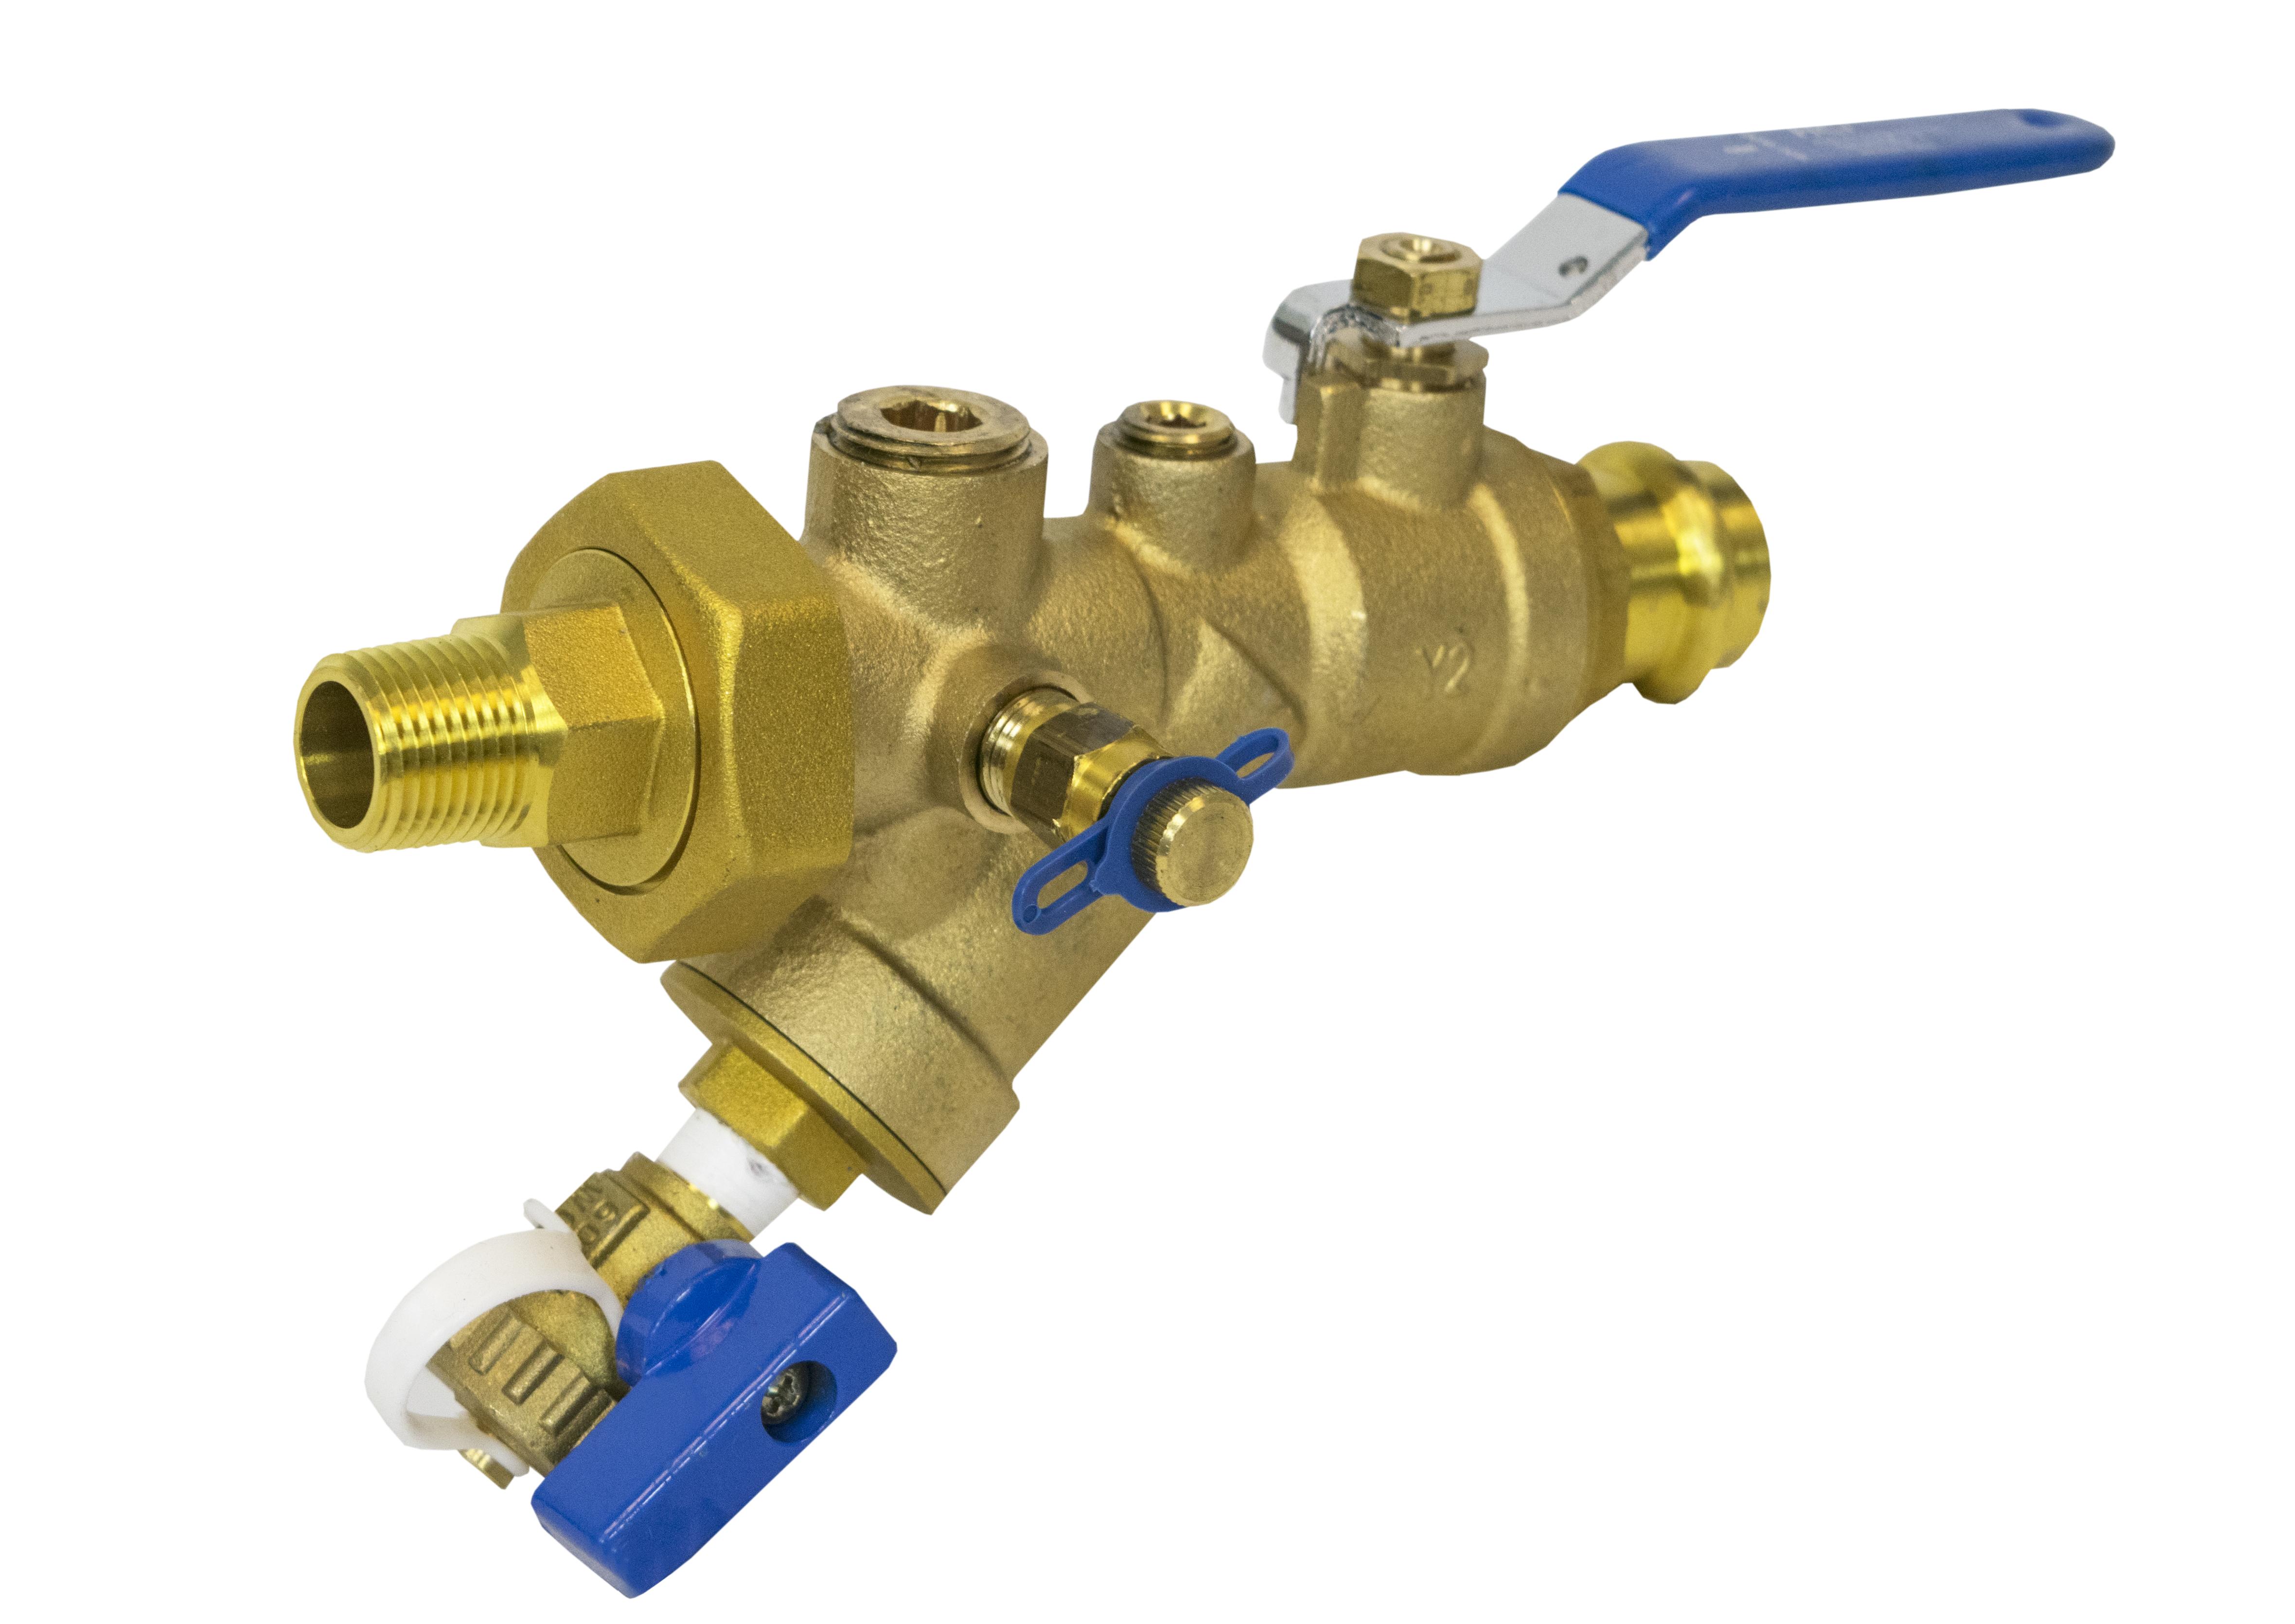 Hci combination strainer valves